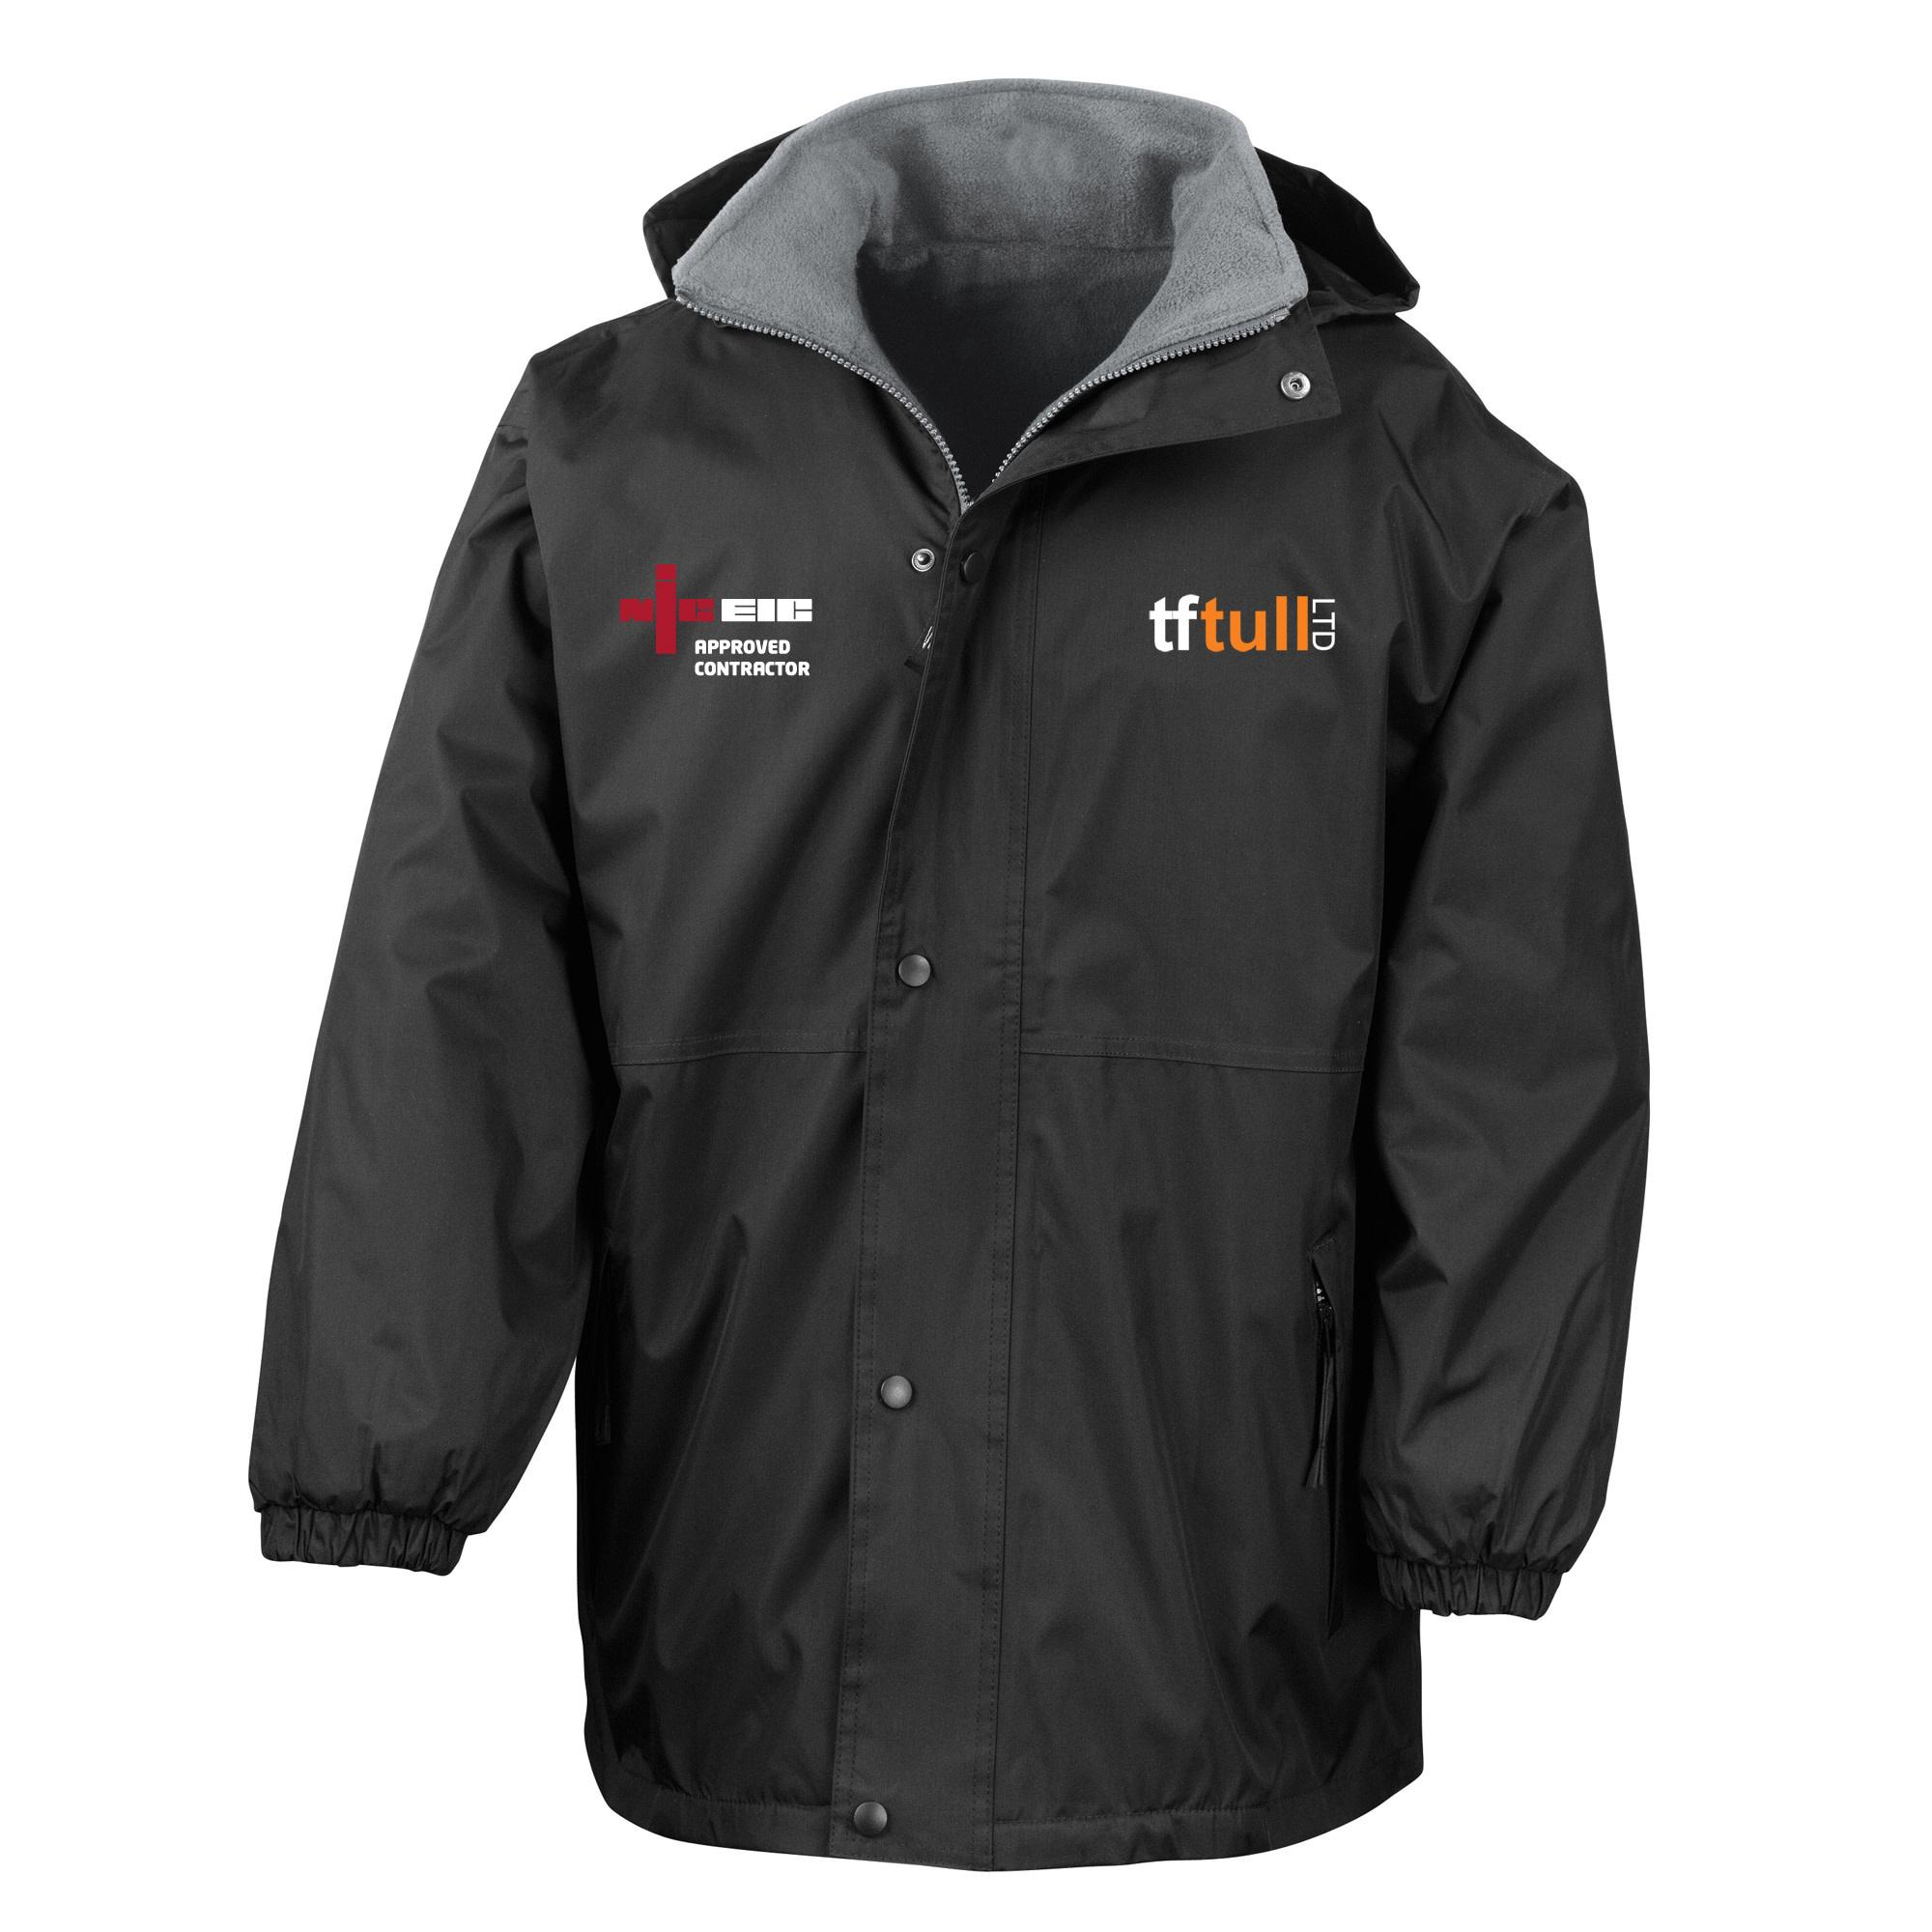 TFTull Reversible StormDri Jacket